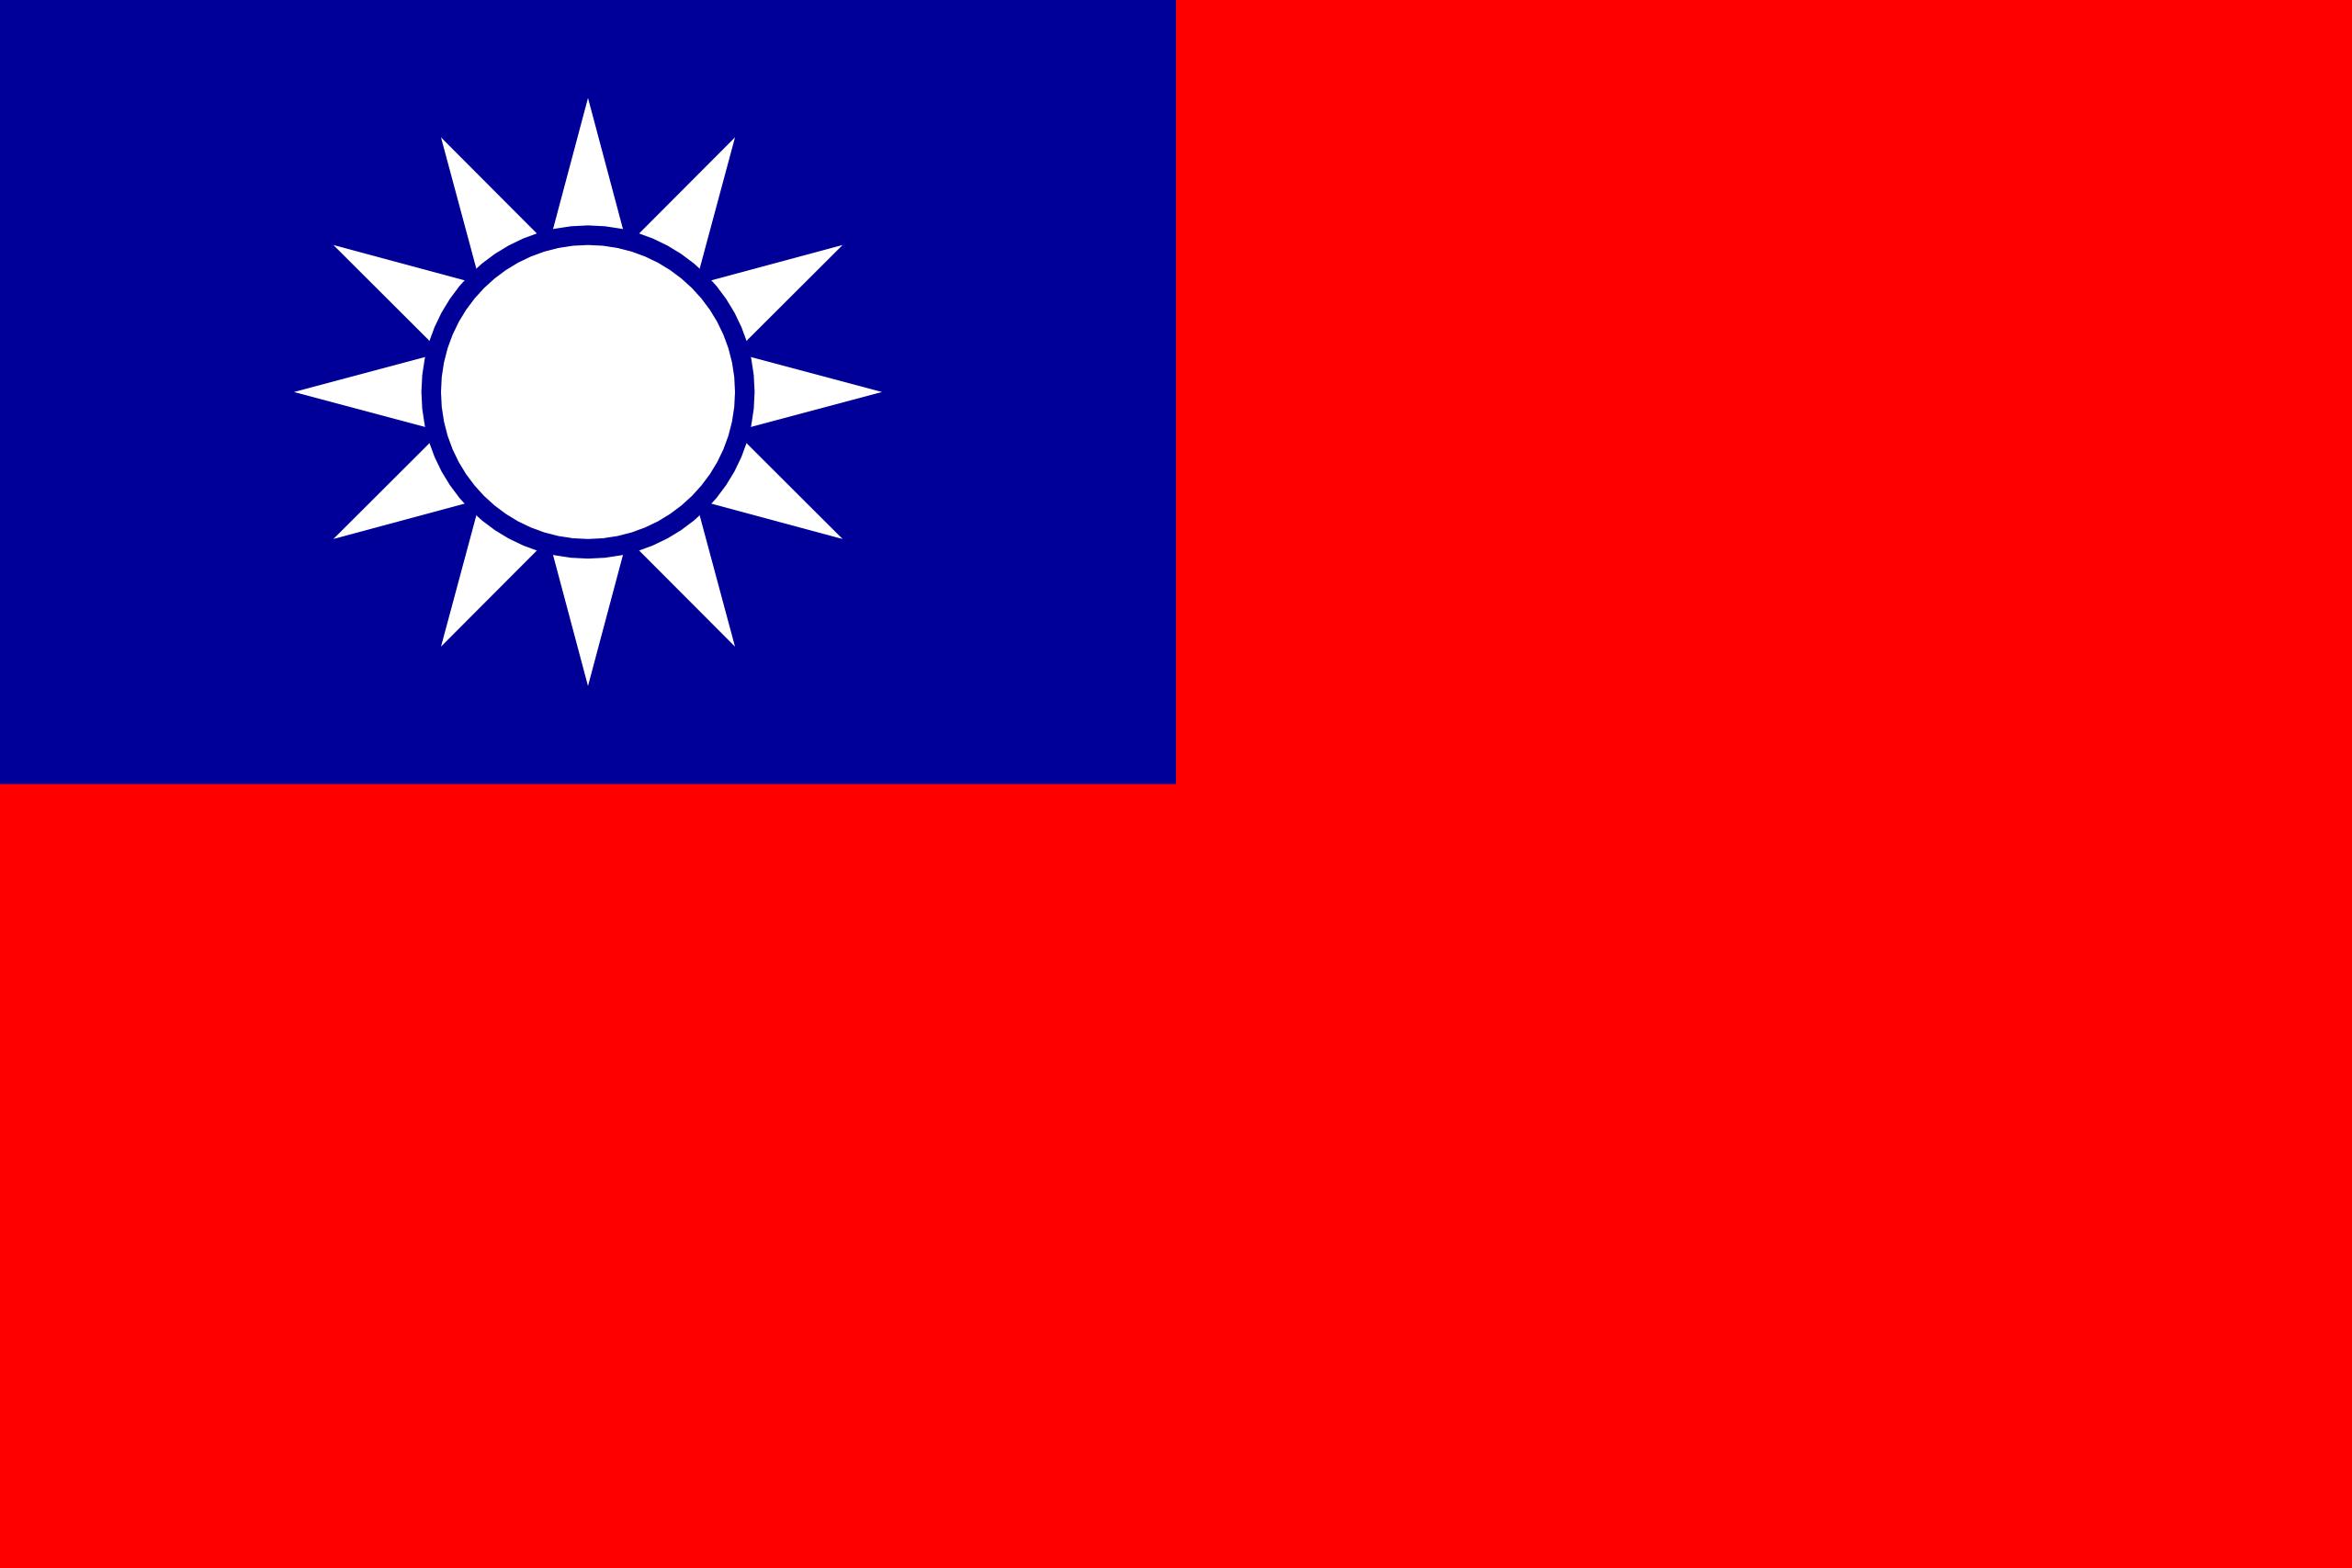 Repubblica di Cina, paese, emblema, logo, simbolo - Sfondi HD - Professor-falken.com